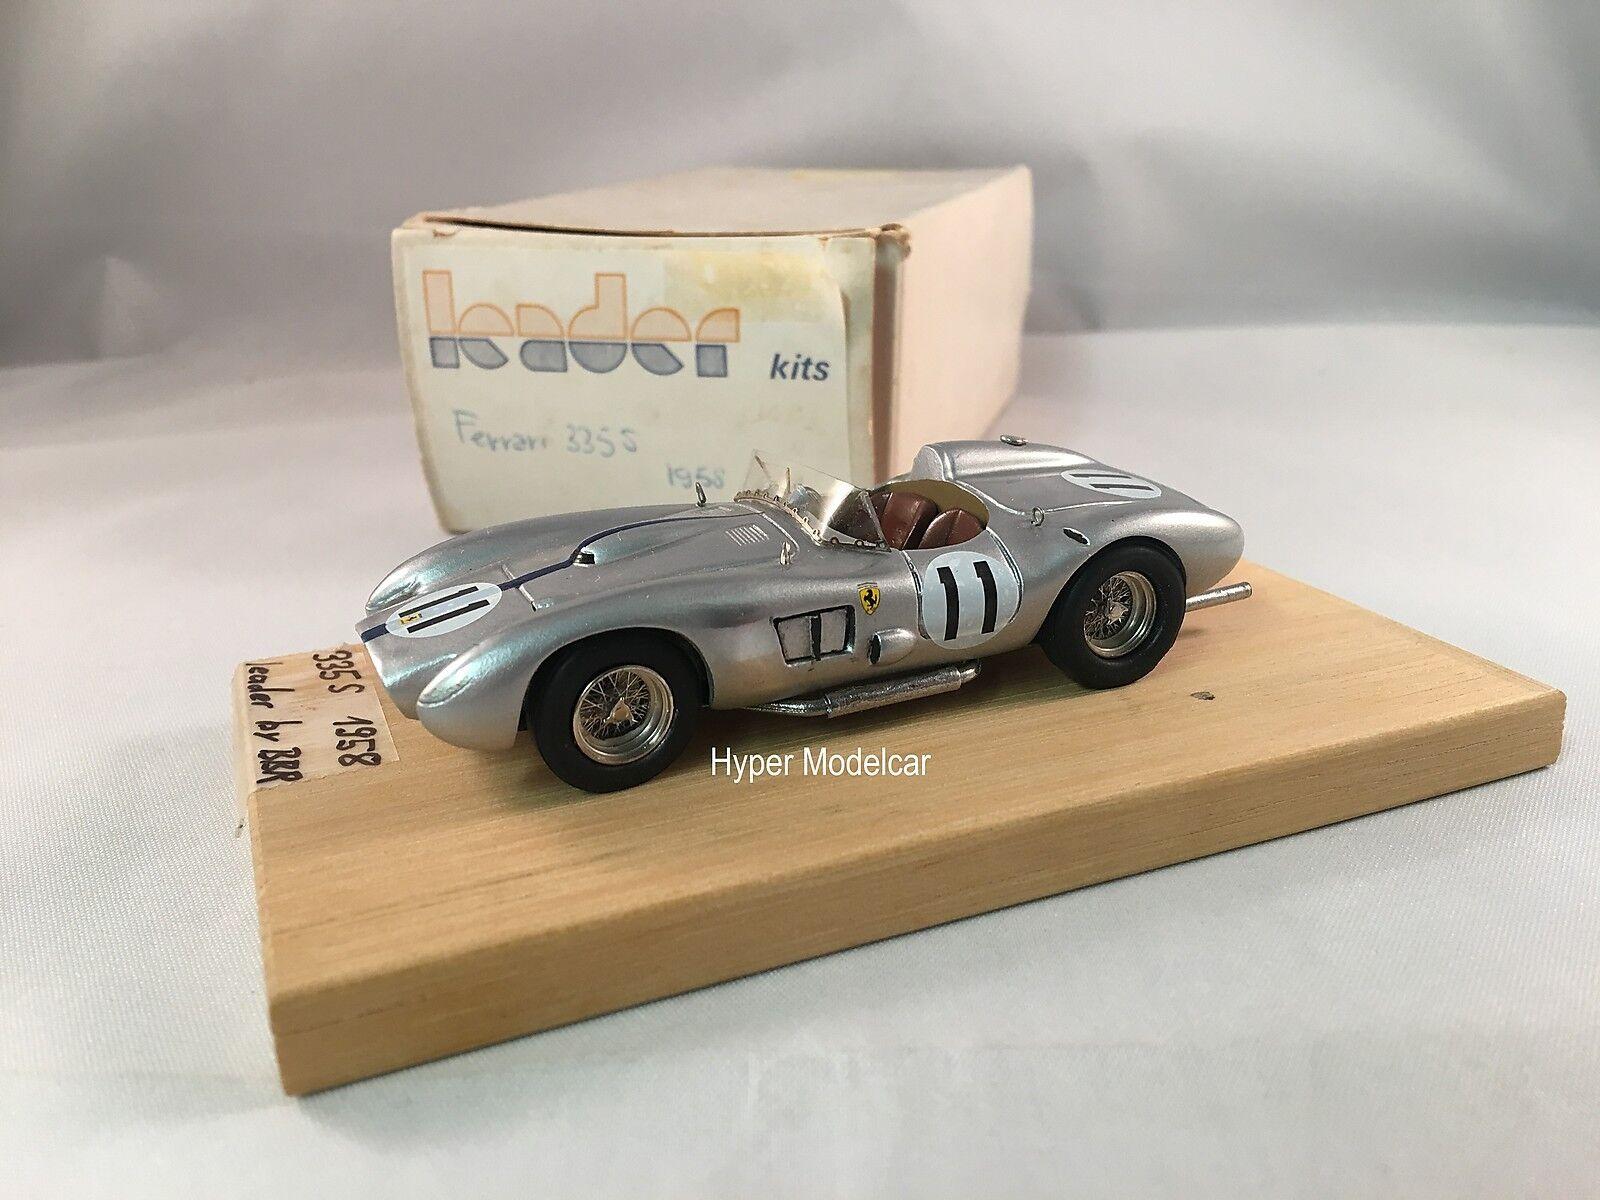 Leader Kits 1 43 By Bbr Ferrari 335 S  11 Riverside 1958